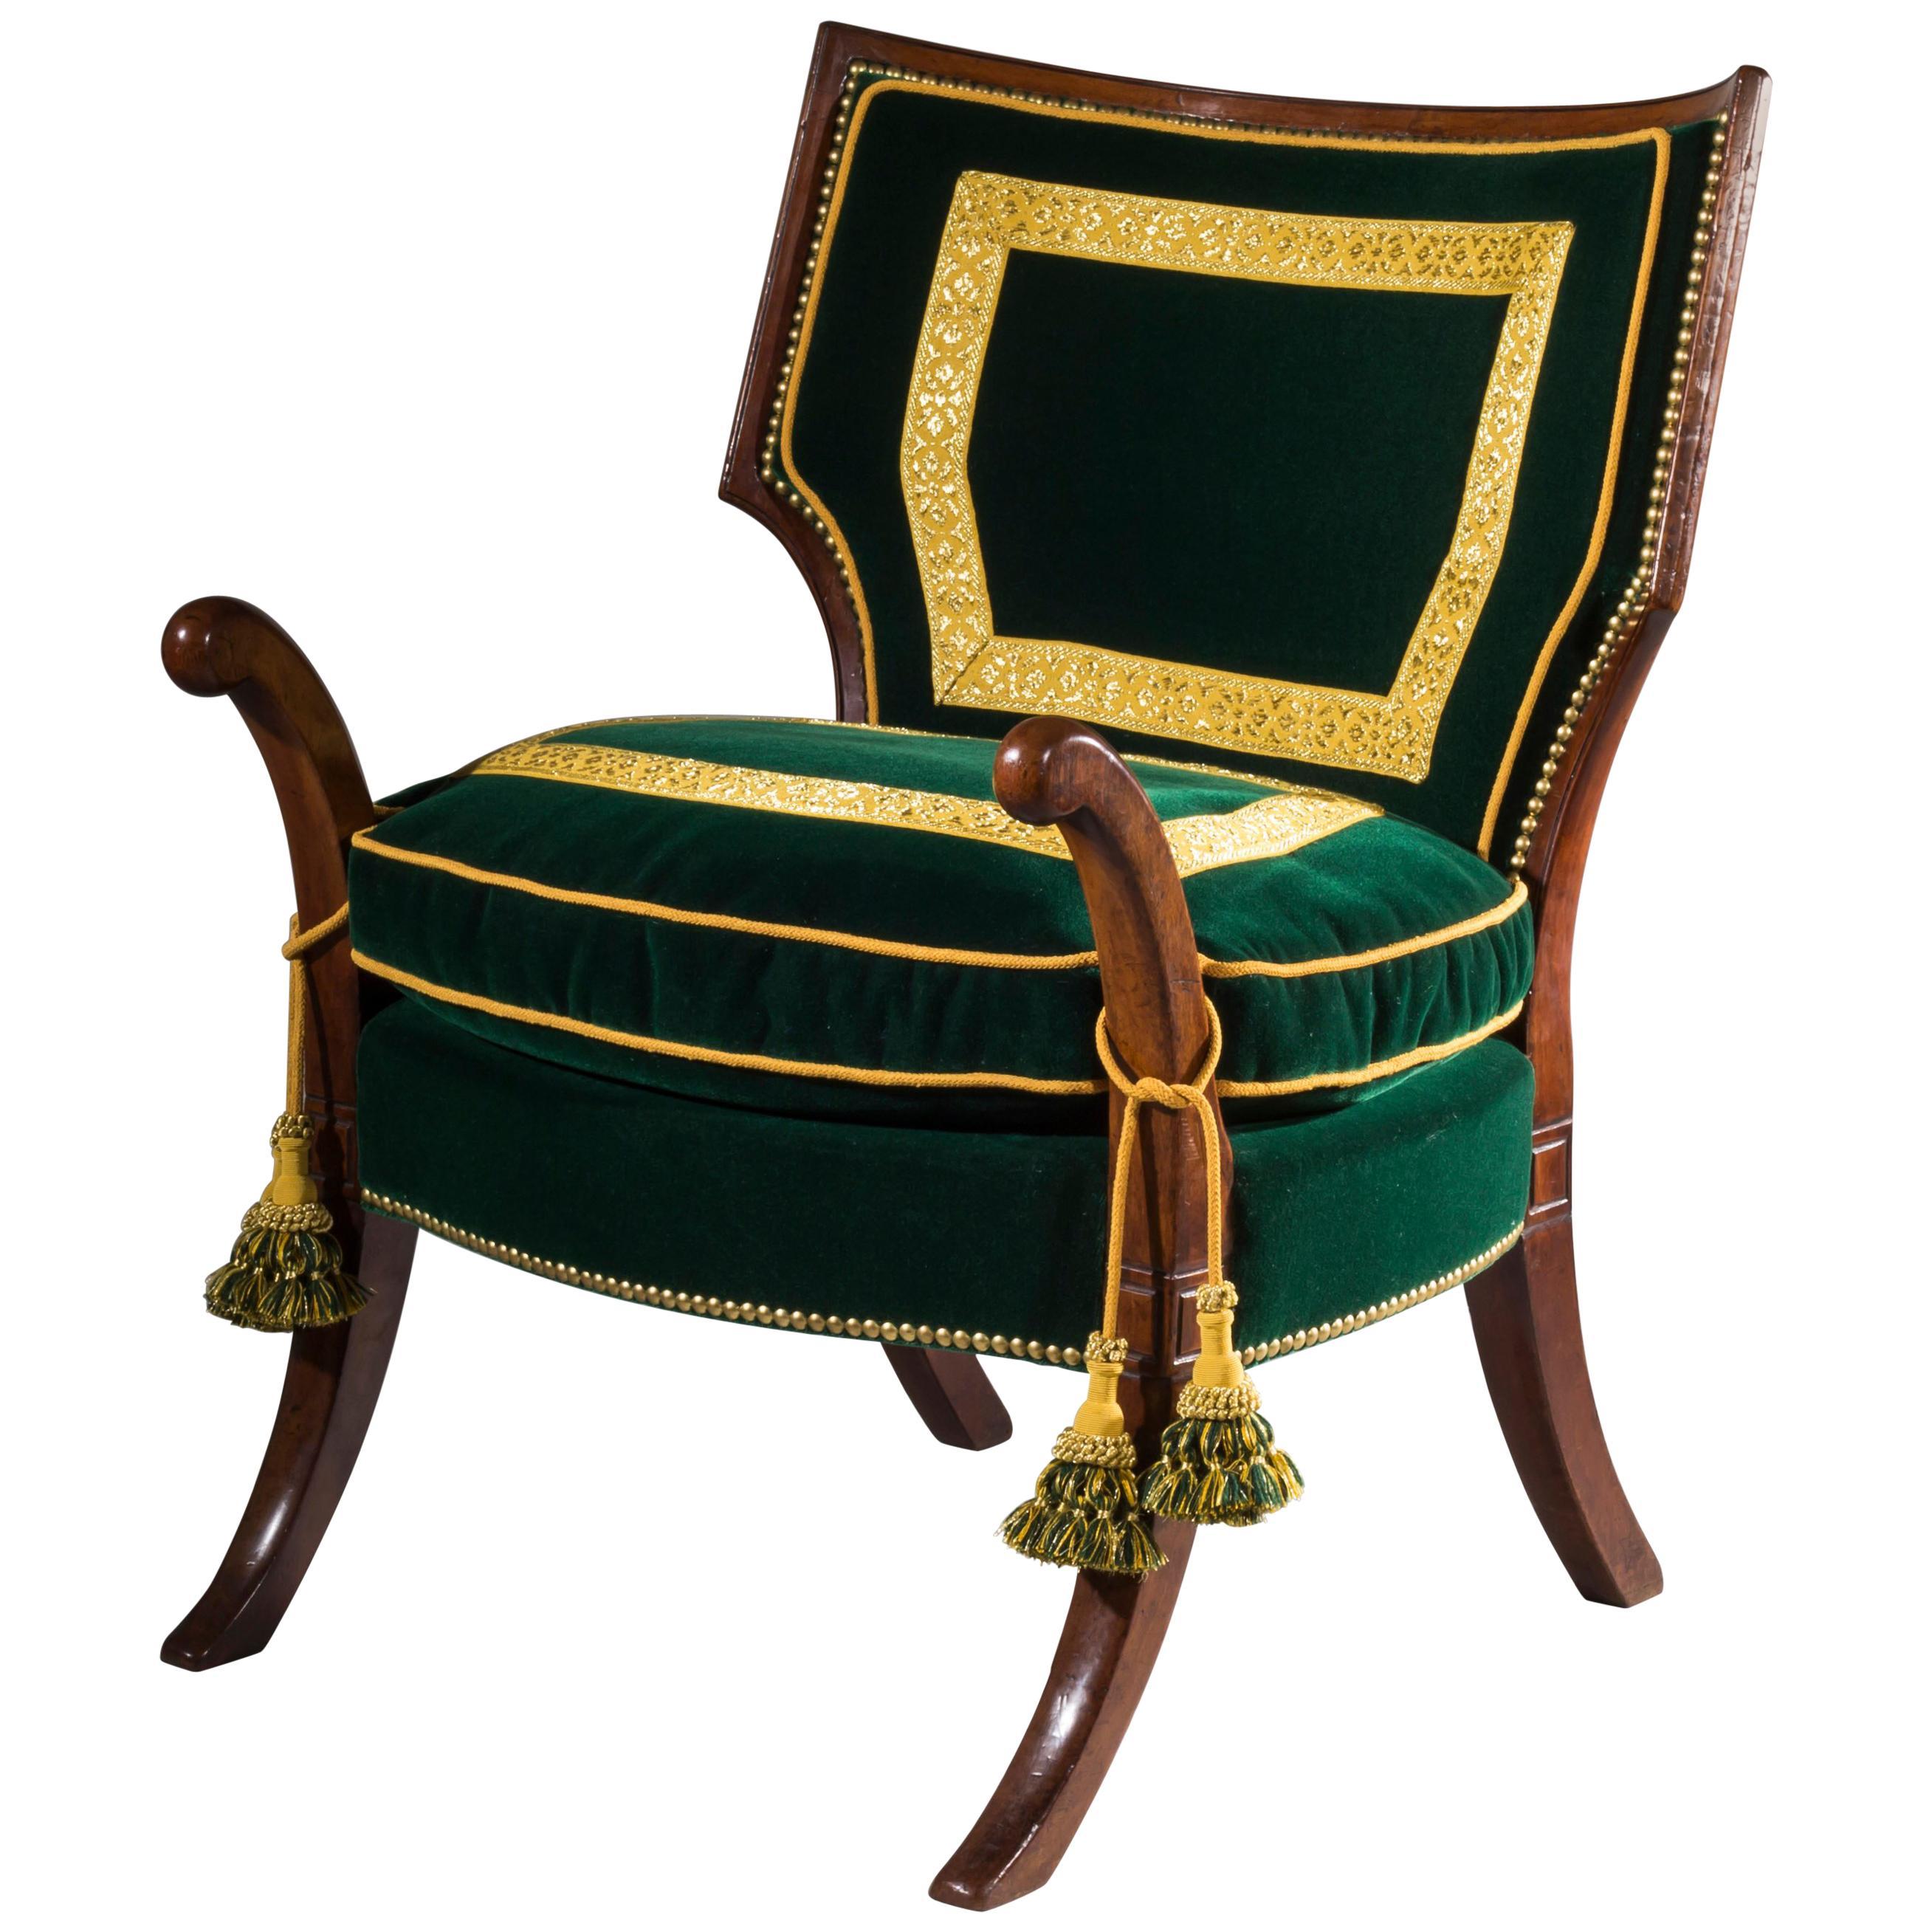 Regency Thomas Hope Greek Revival Klismos Library Chair  sc 1 st  1stDibs & English Regency Period Mahogany Armchair Designed by Thomas Hope For ...